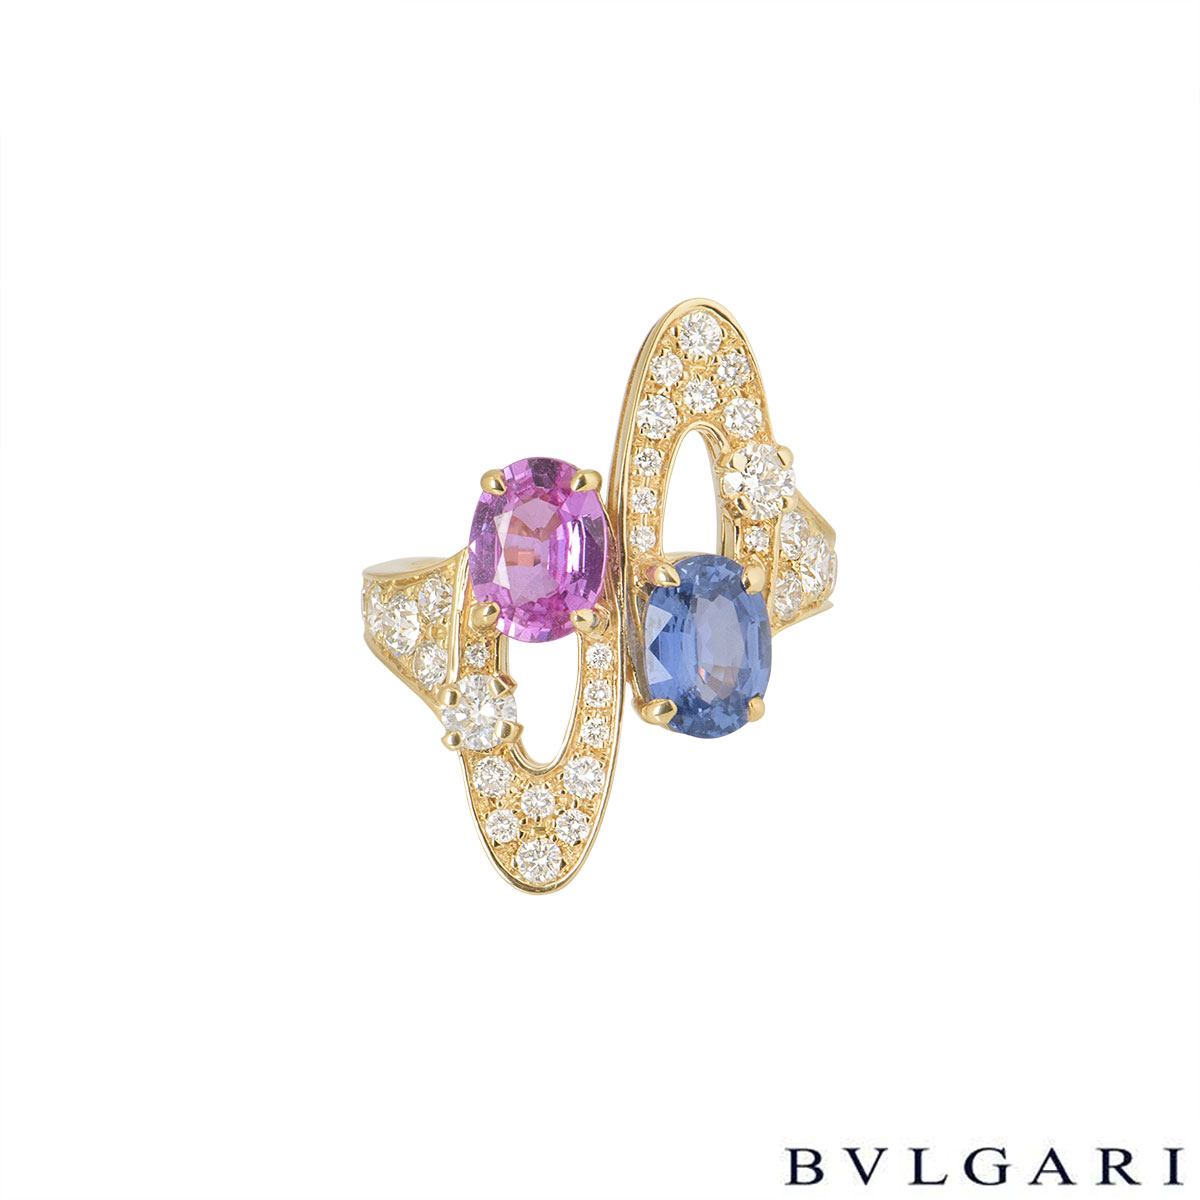 Bvlgari Yellow Gold Diamond & Multi-Gem Ring